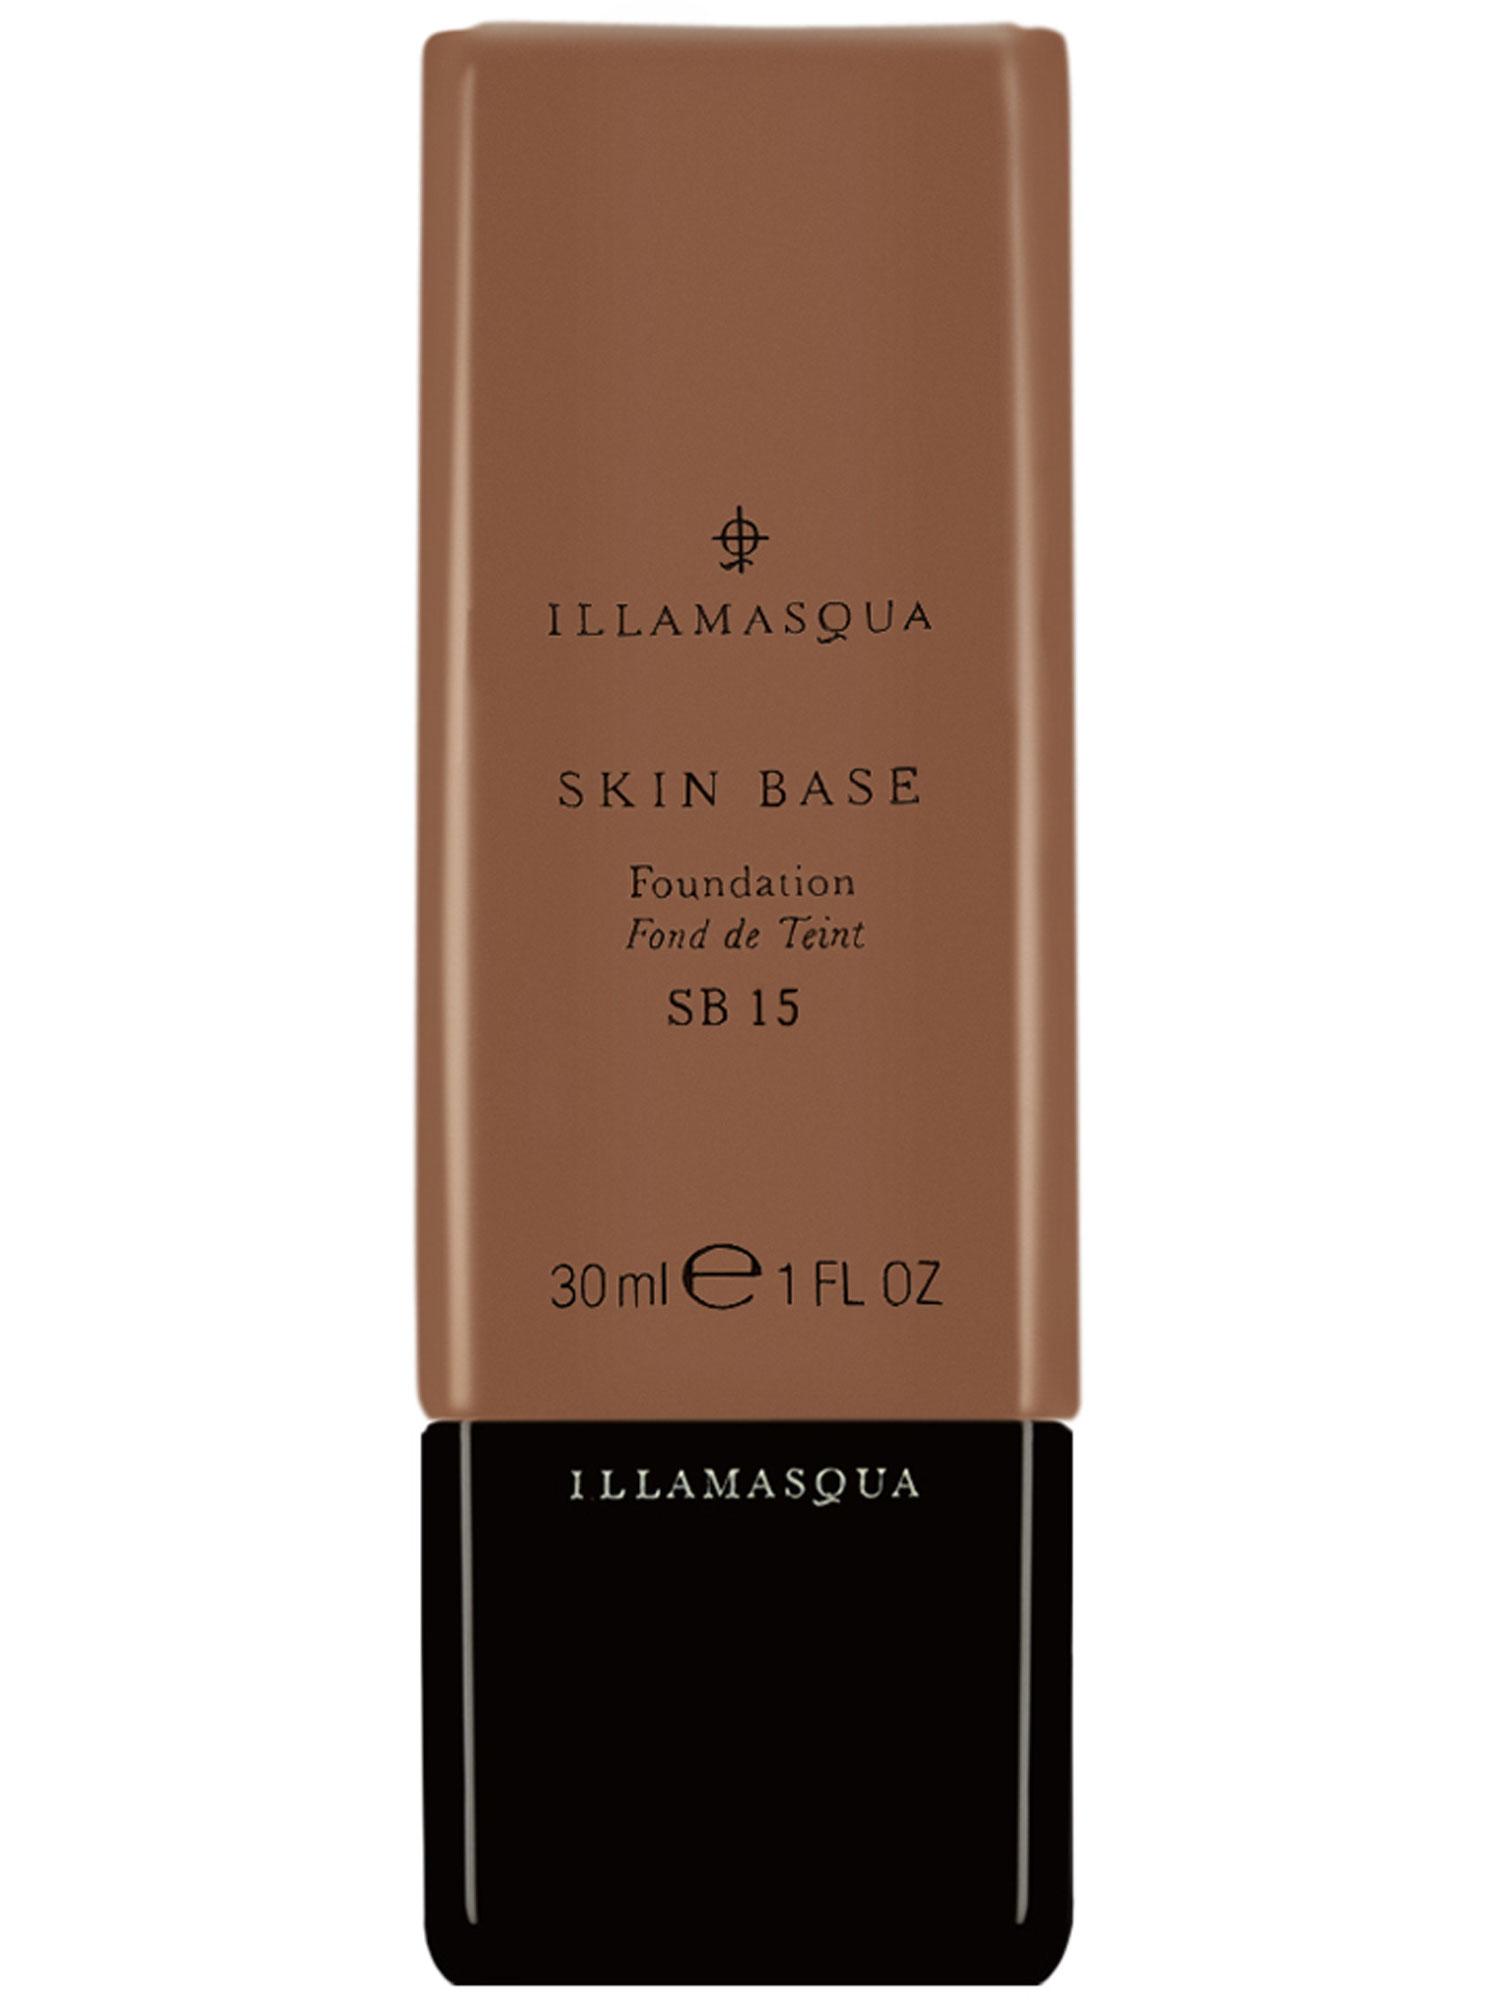 ILLAMASQUA-Skin-Base-Foundation-30-ml-1-FL-OZ-43-NEW thumbnail 17